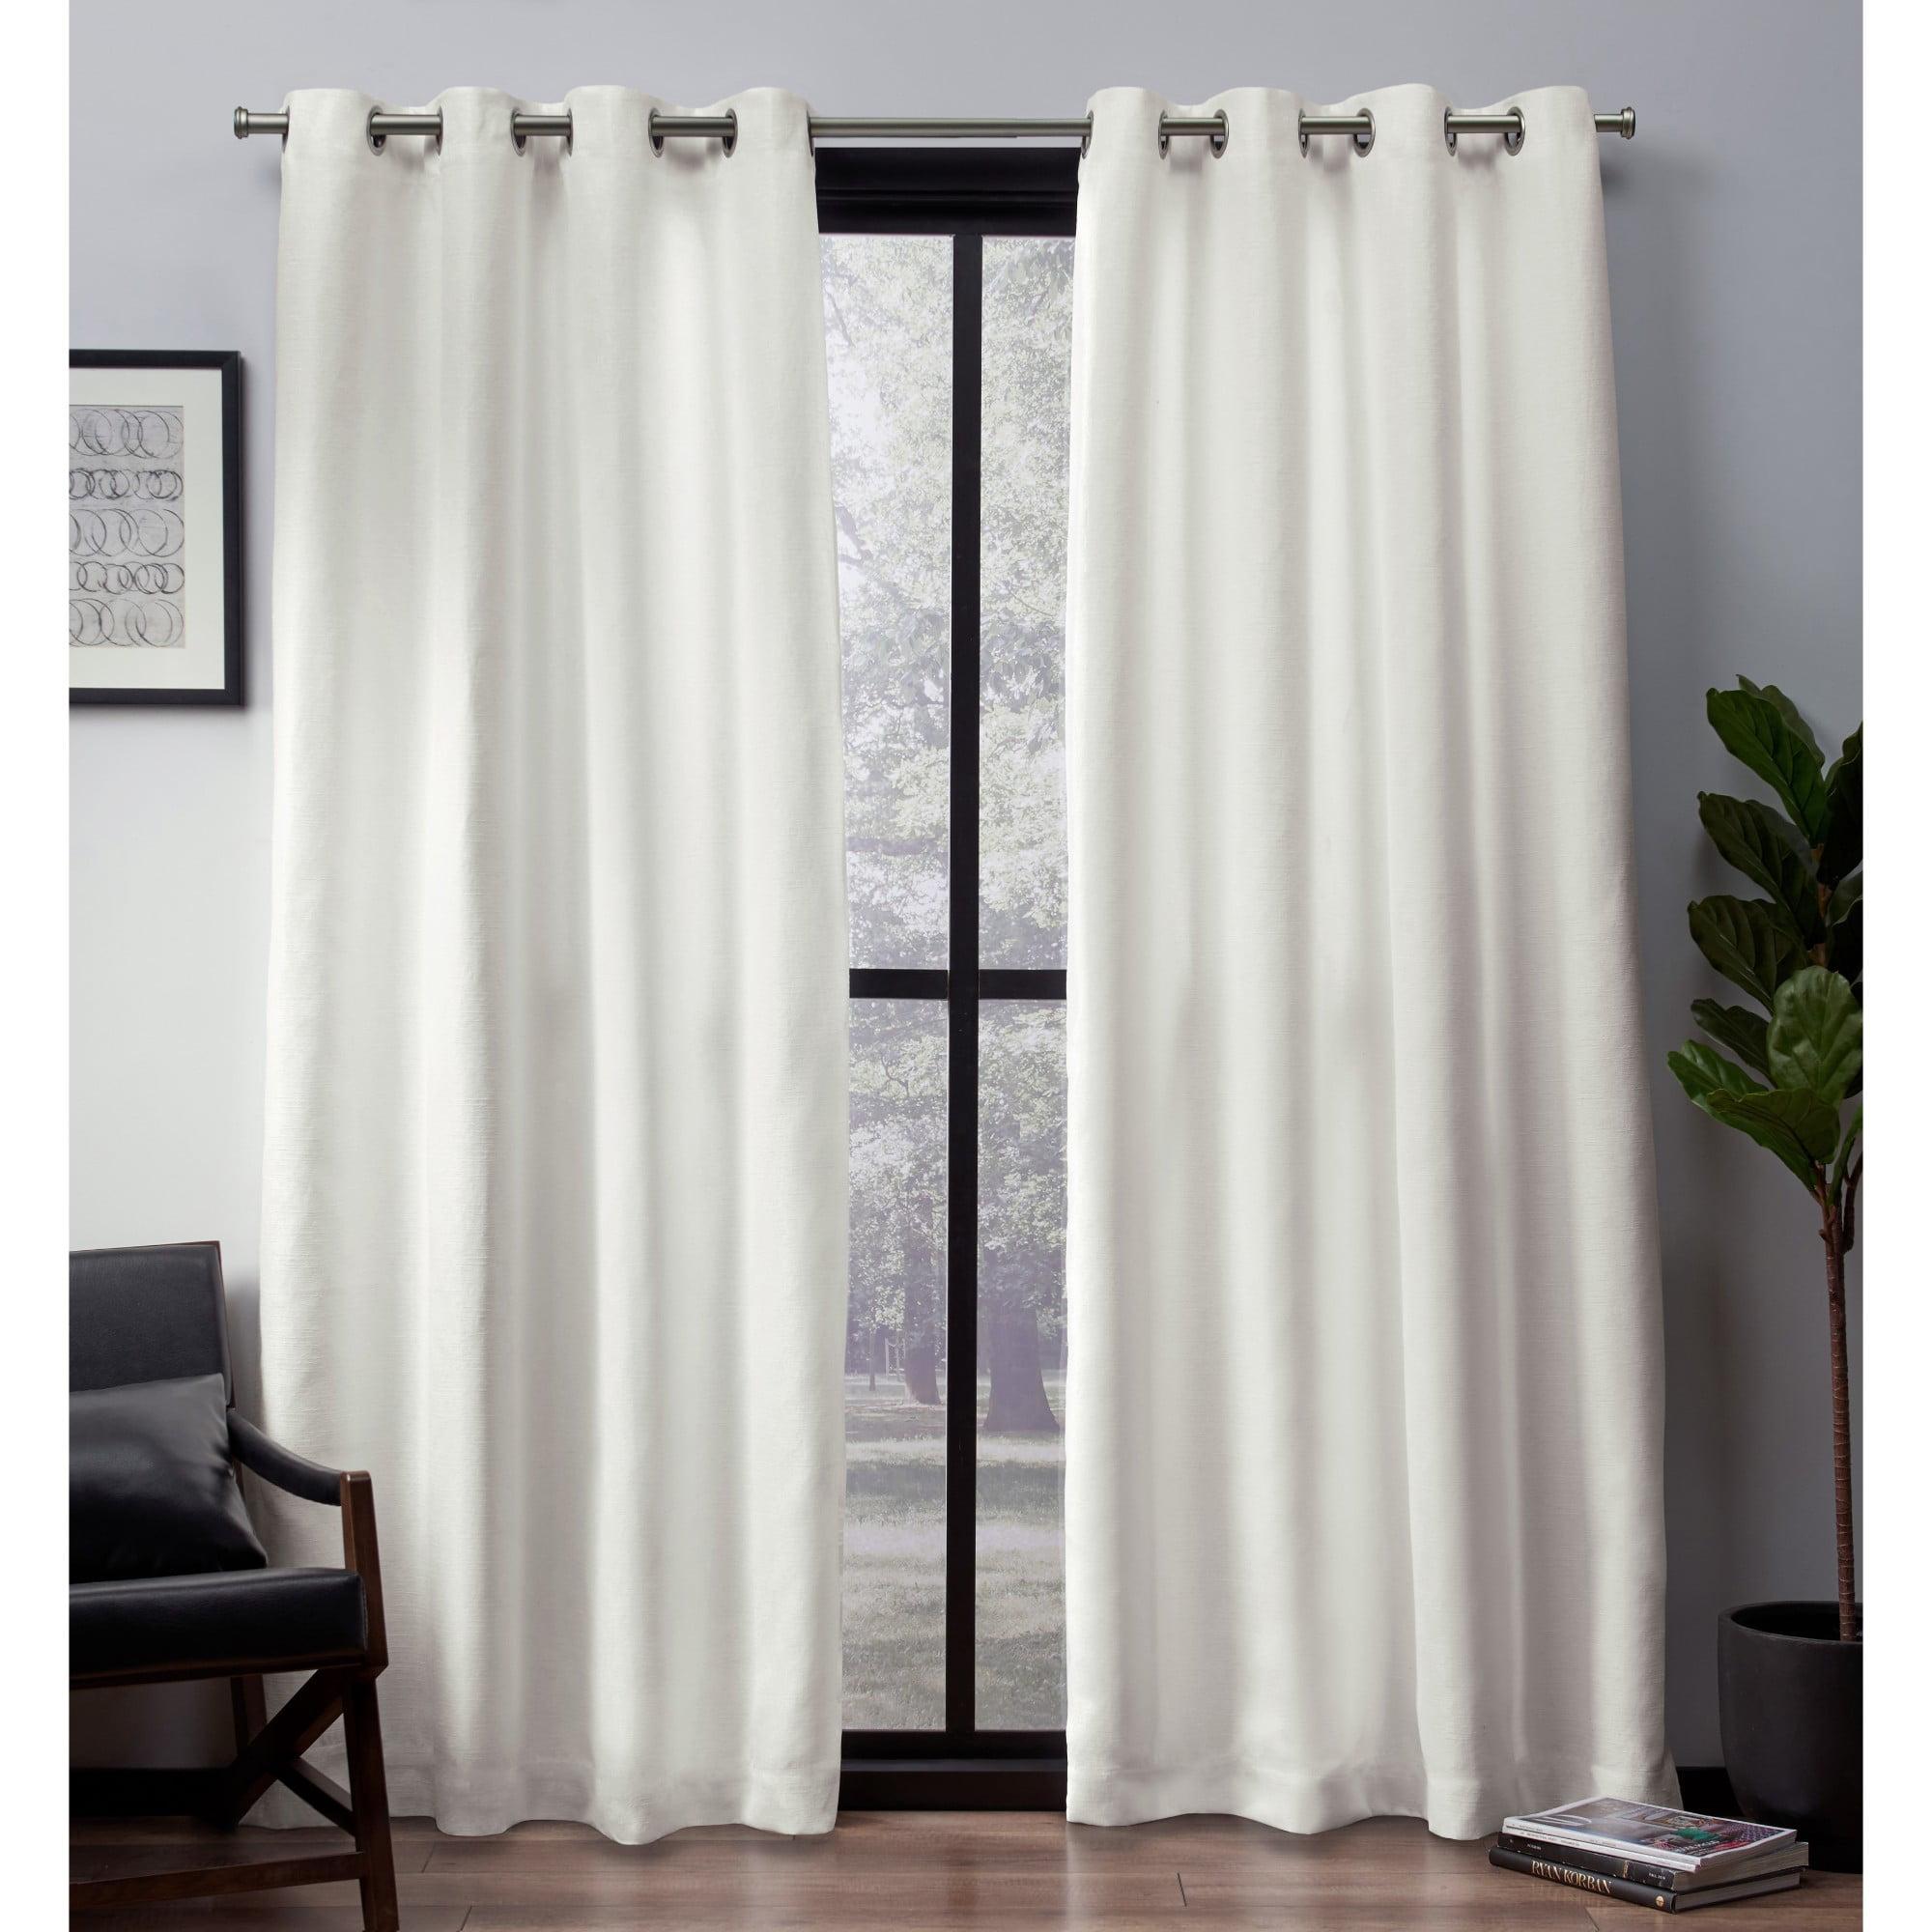 Exclusive Home Curtains 2 Pack Leeds Textured Slub Woven Blackout Grommet Top Curtain Panels